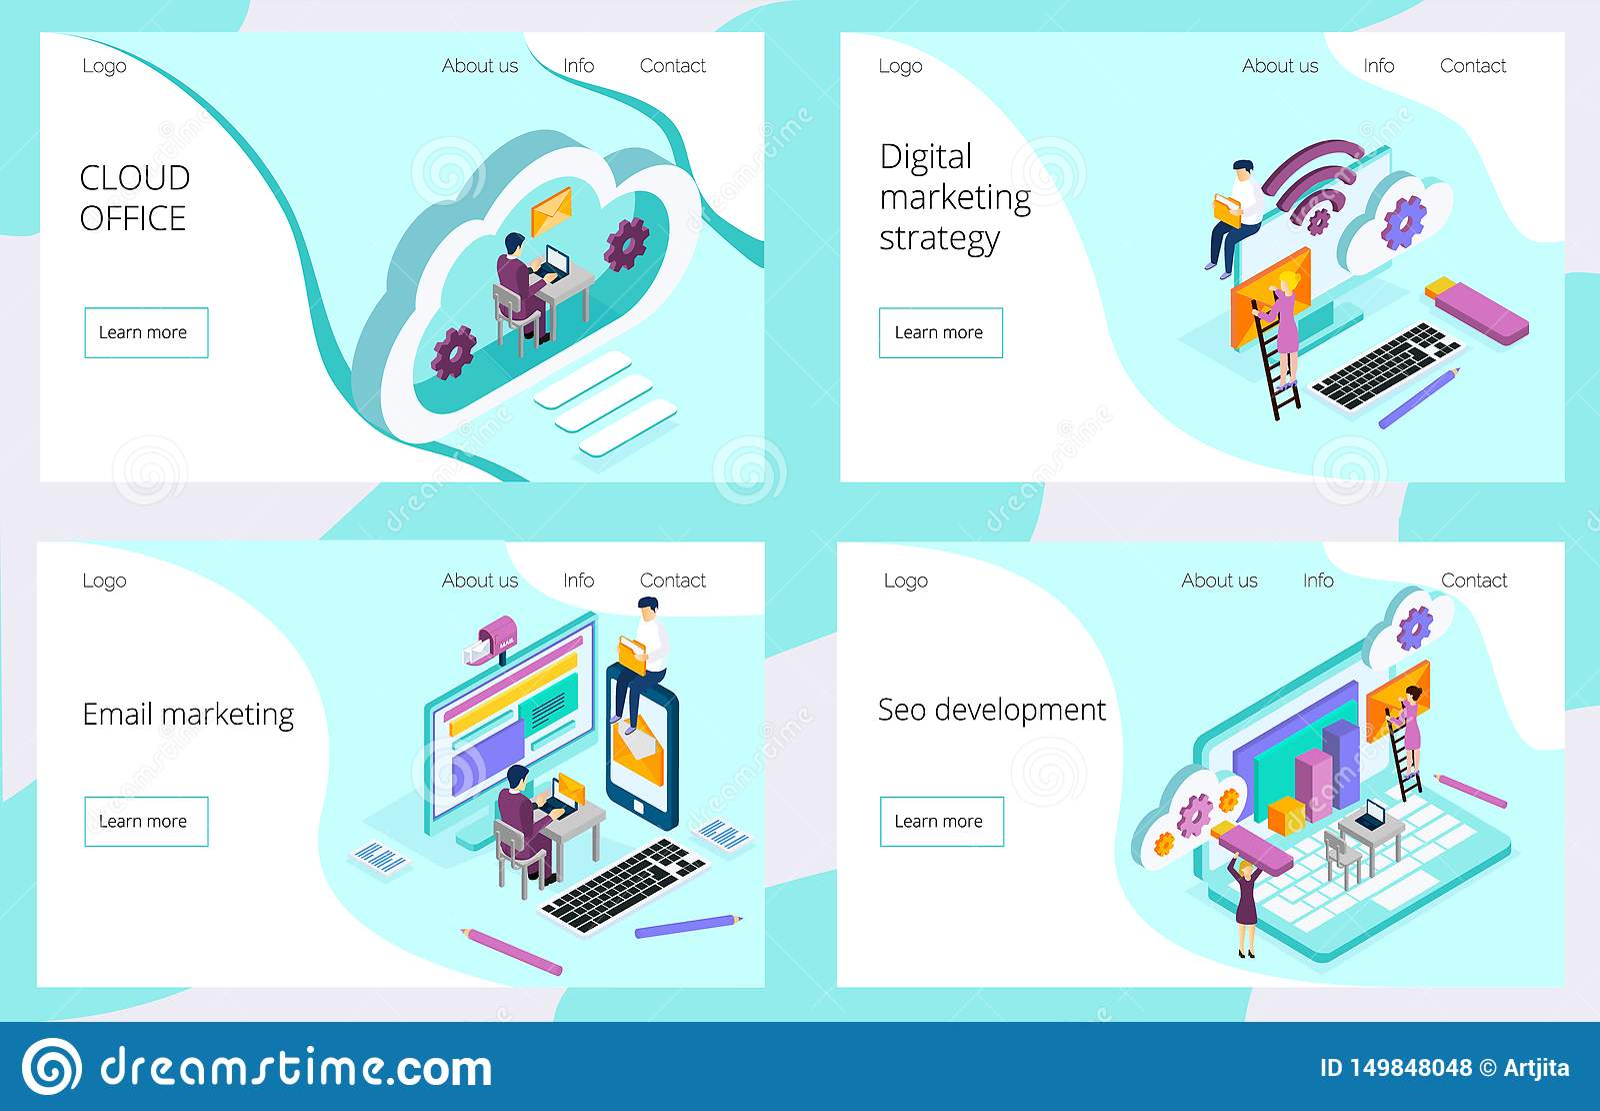 Isometric ομάδα των ειδικών που εργάζονται στην ψηφιακή προσγειωμένος σελίδα εμπορικής στρατηγικής